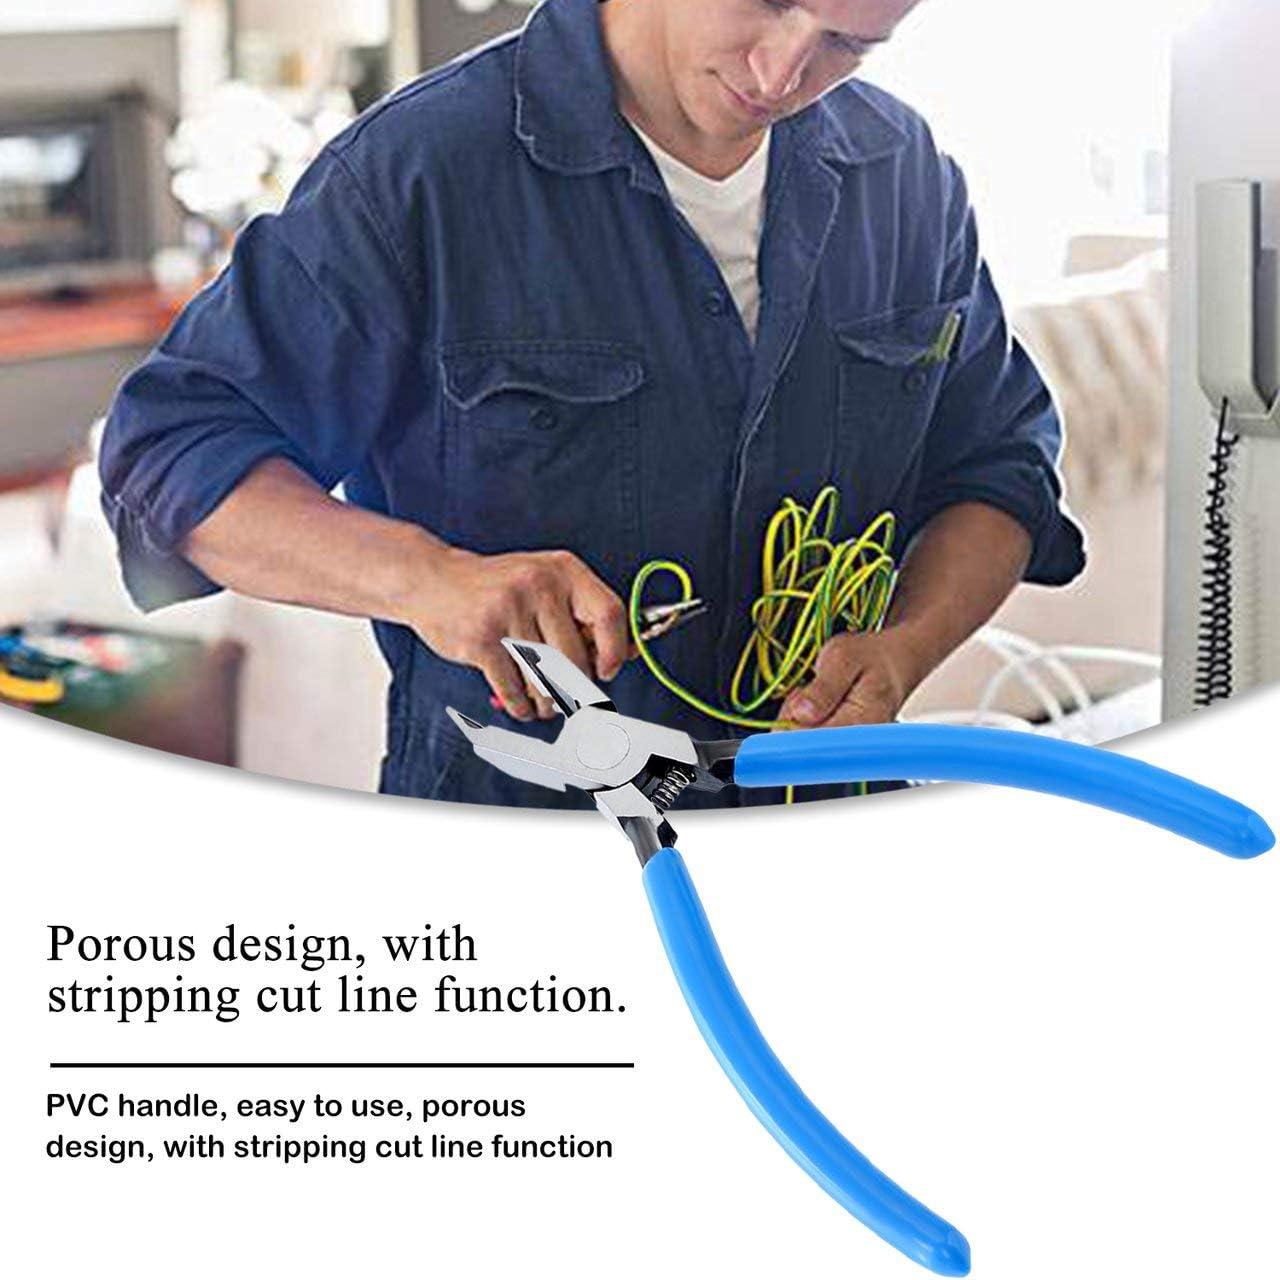 FRjasnyfall Pince diagonale en fil Pince /à d/énuder lat/érale de type E de typeE Bleu 150mm Pince /à d/énuder Pince /à d/énuder Outils /à main multitool